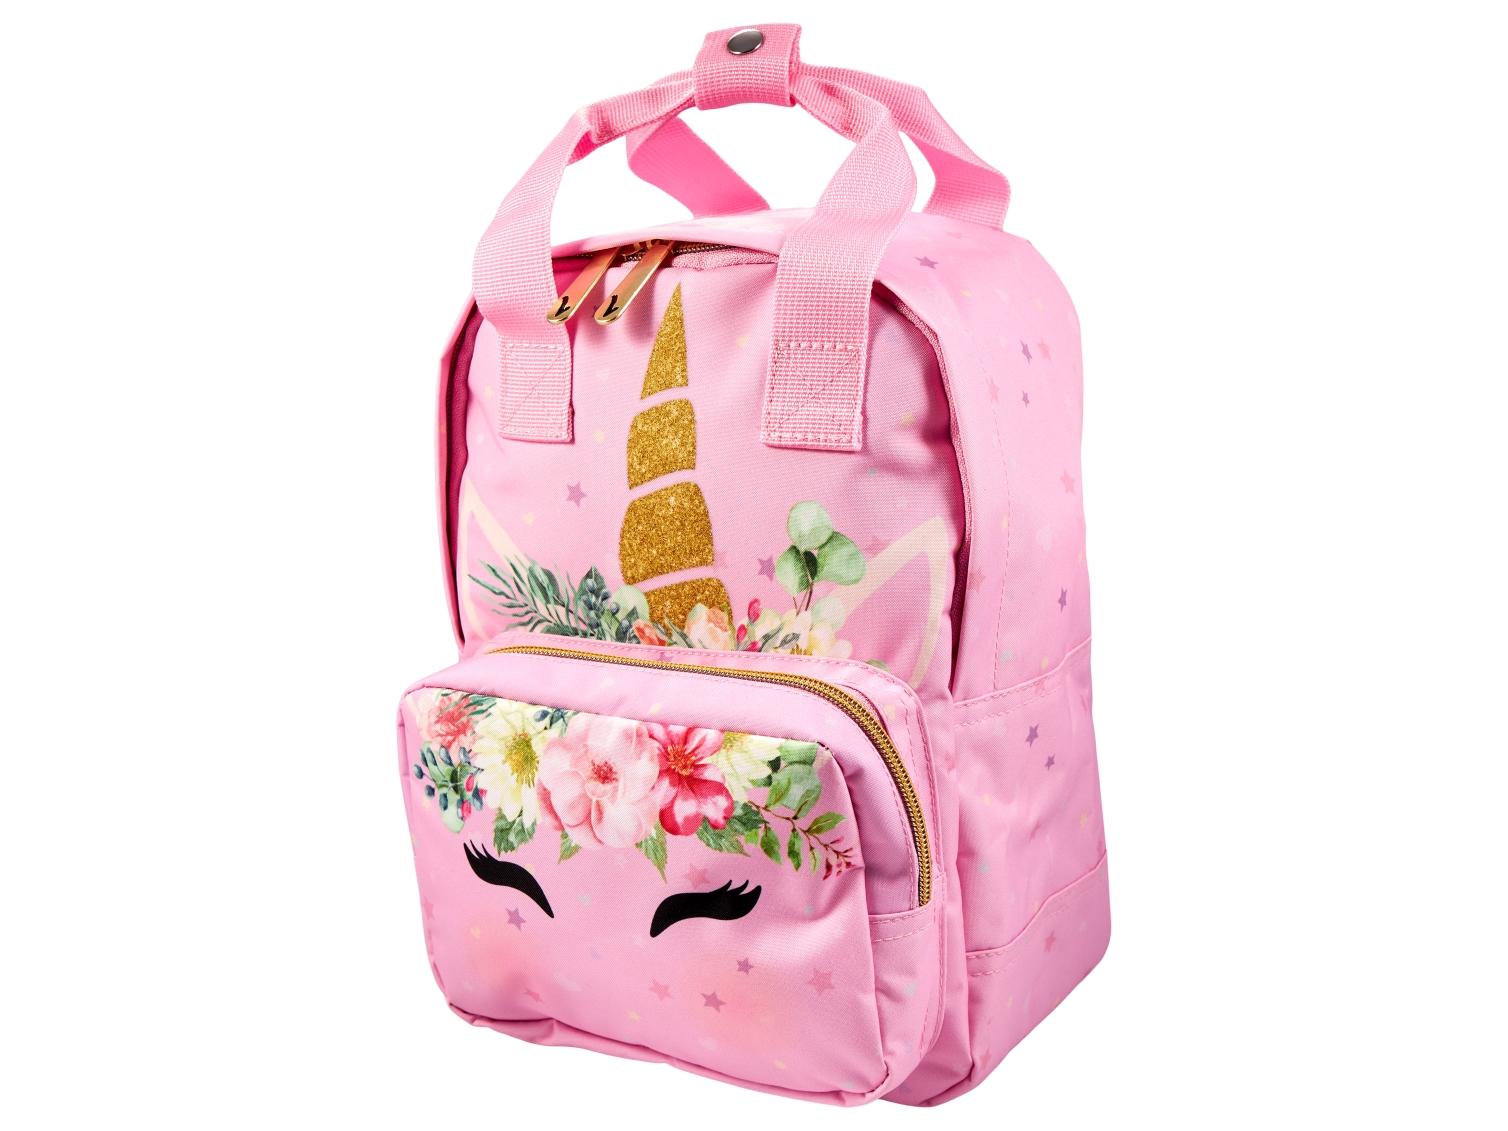 Valiant - Small Backpack 7 L - Unicorn (099209410)